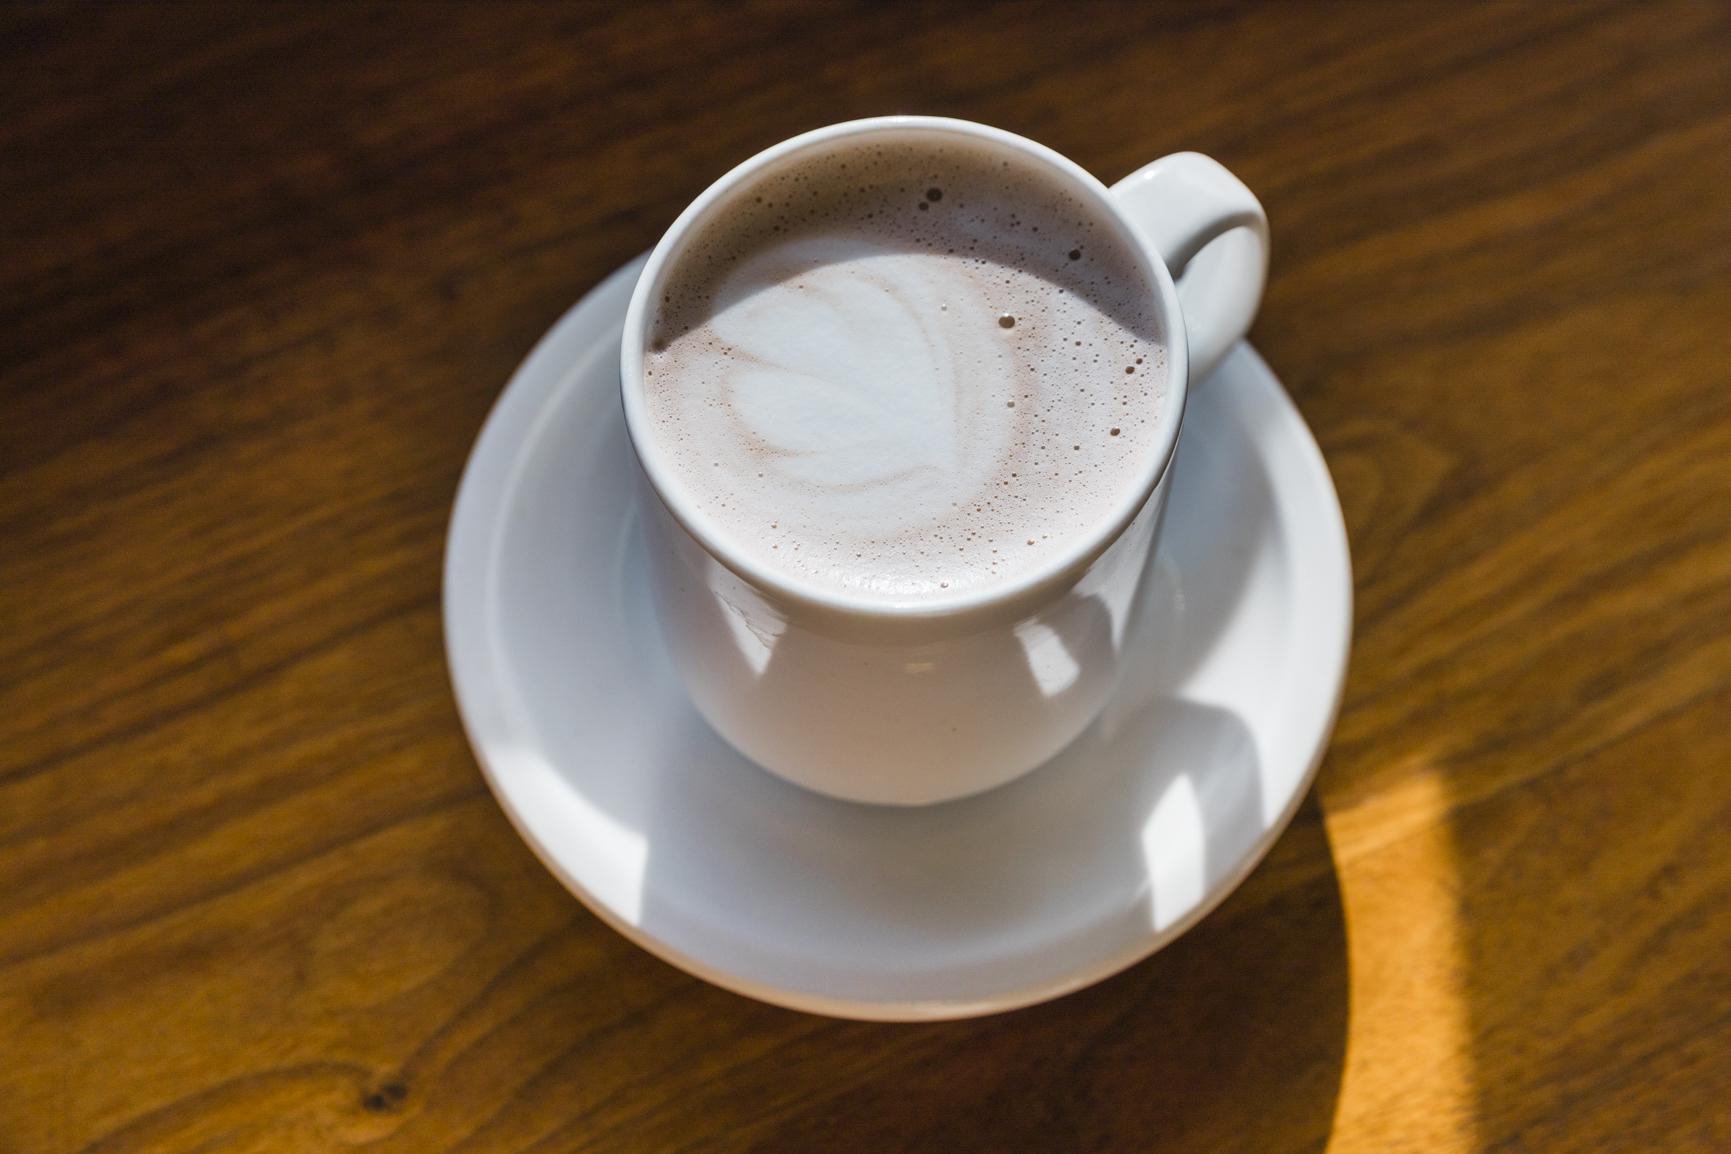 closeup of the hot chocolate